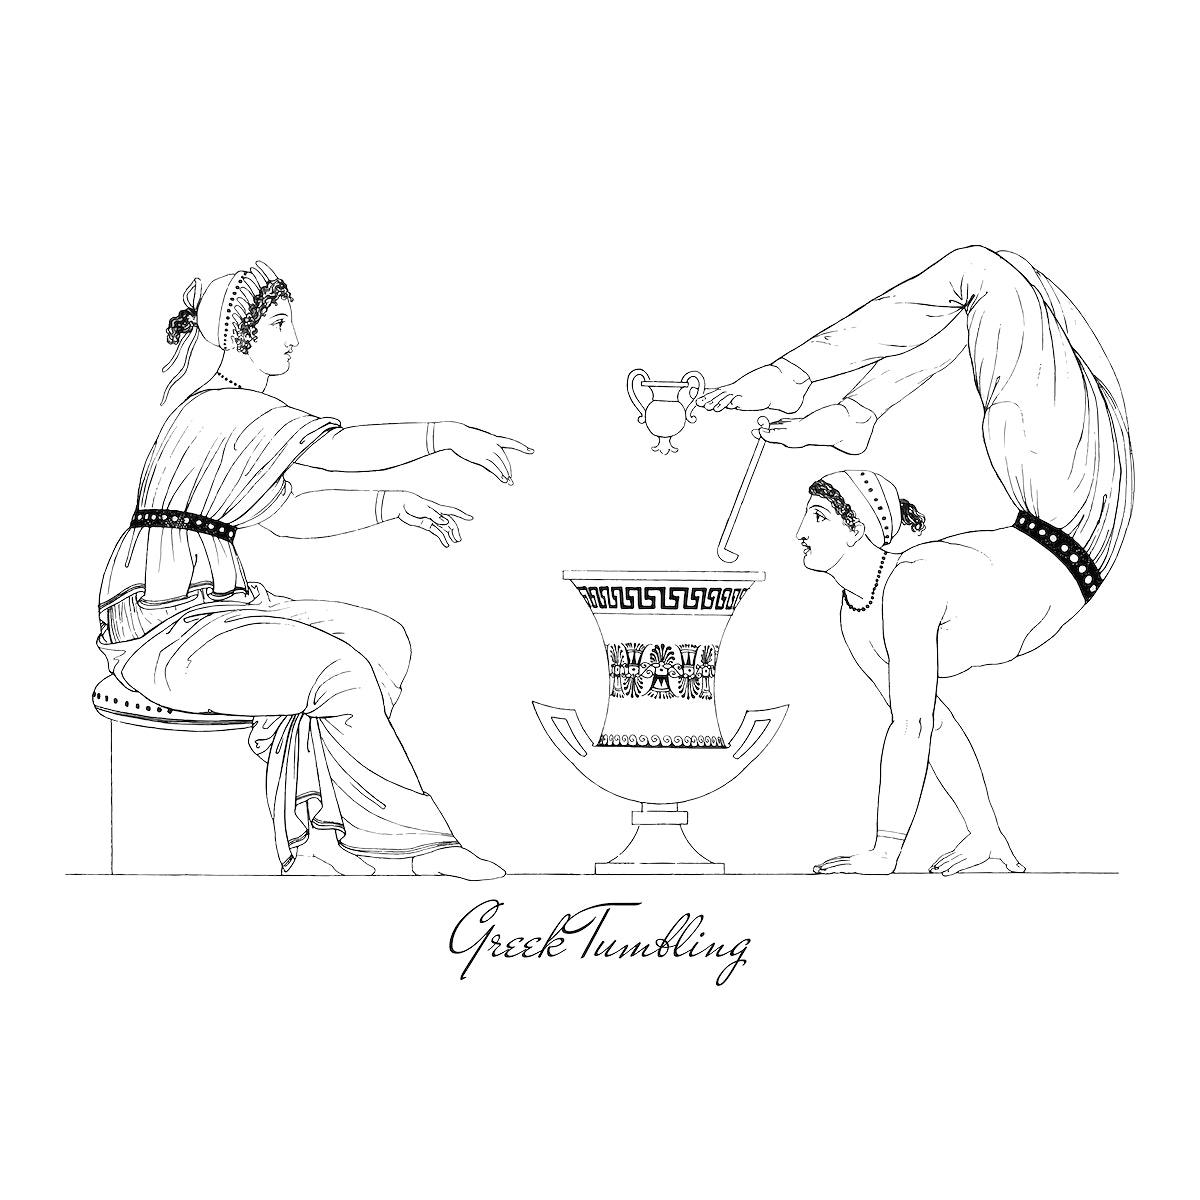 Ancient Greece illustration